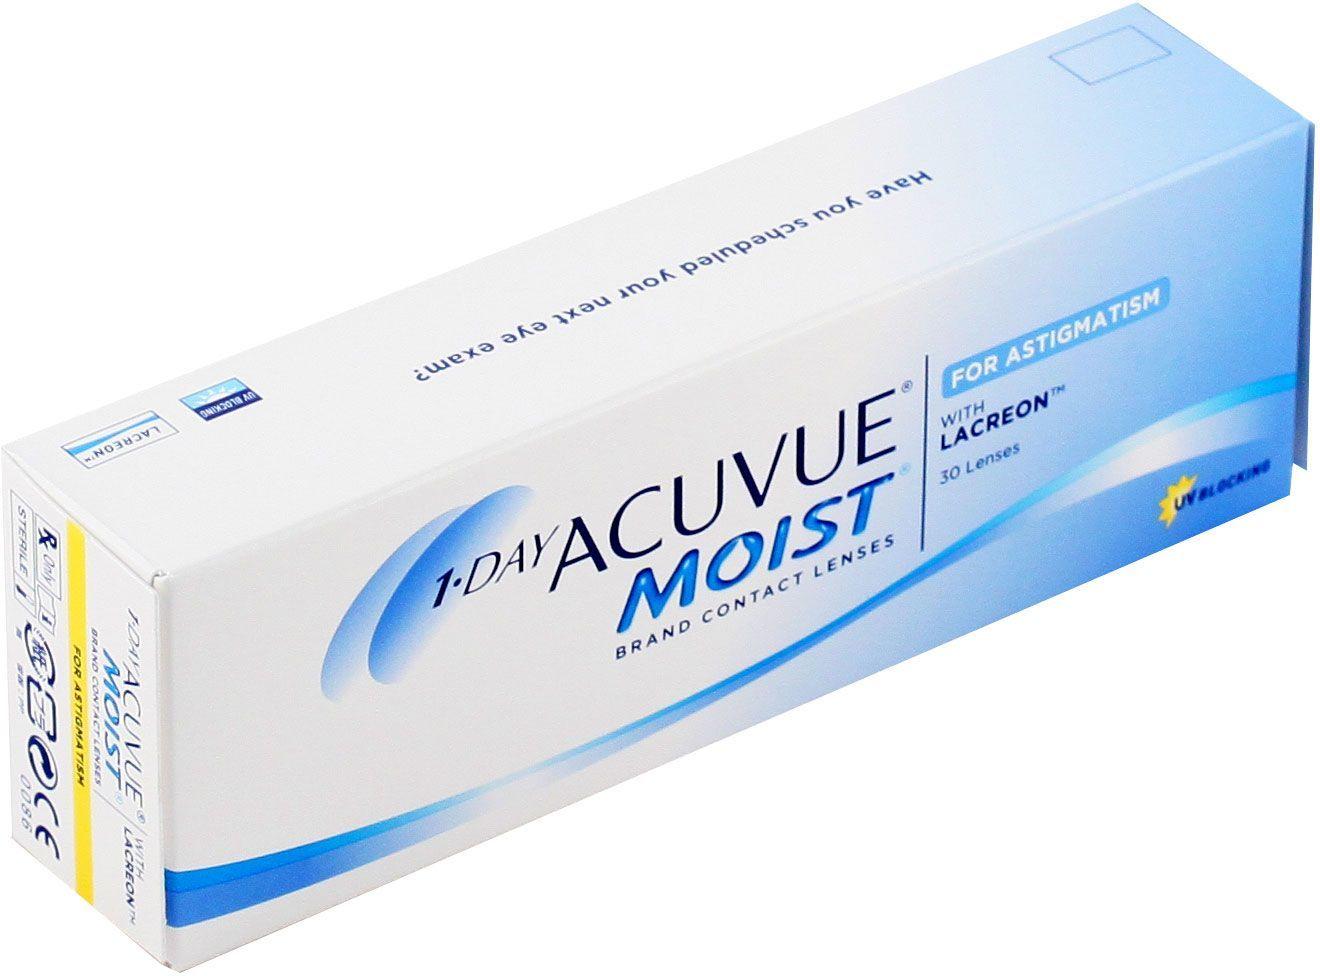 bba0ca38c7f5 Купить контактные линзы 1 DAY ACUVUE MOIST for ASTIGMATISM (30 линз ...